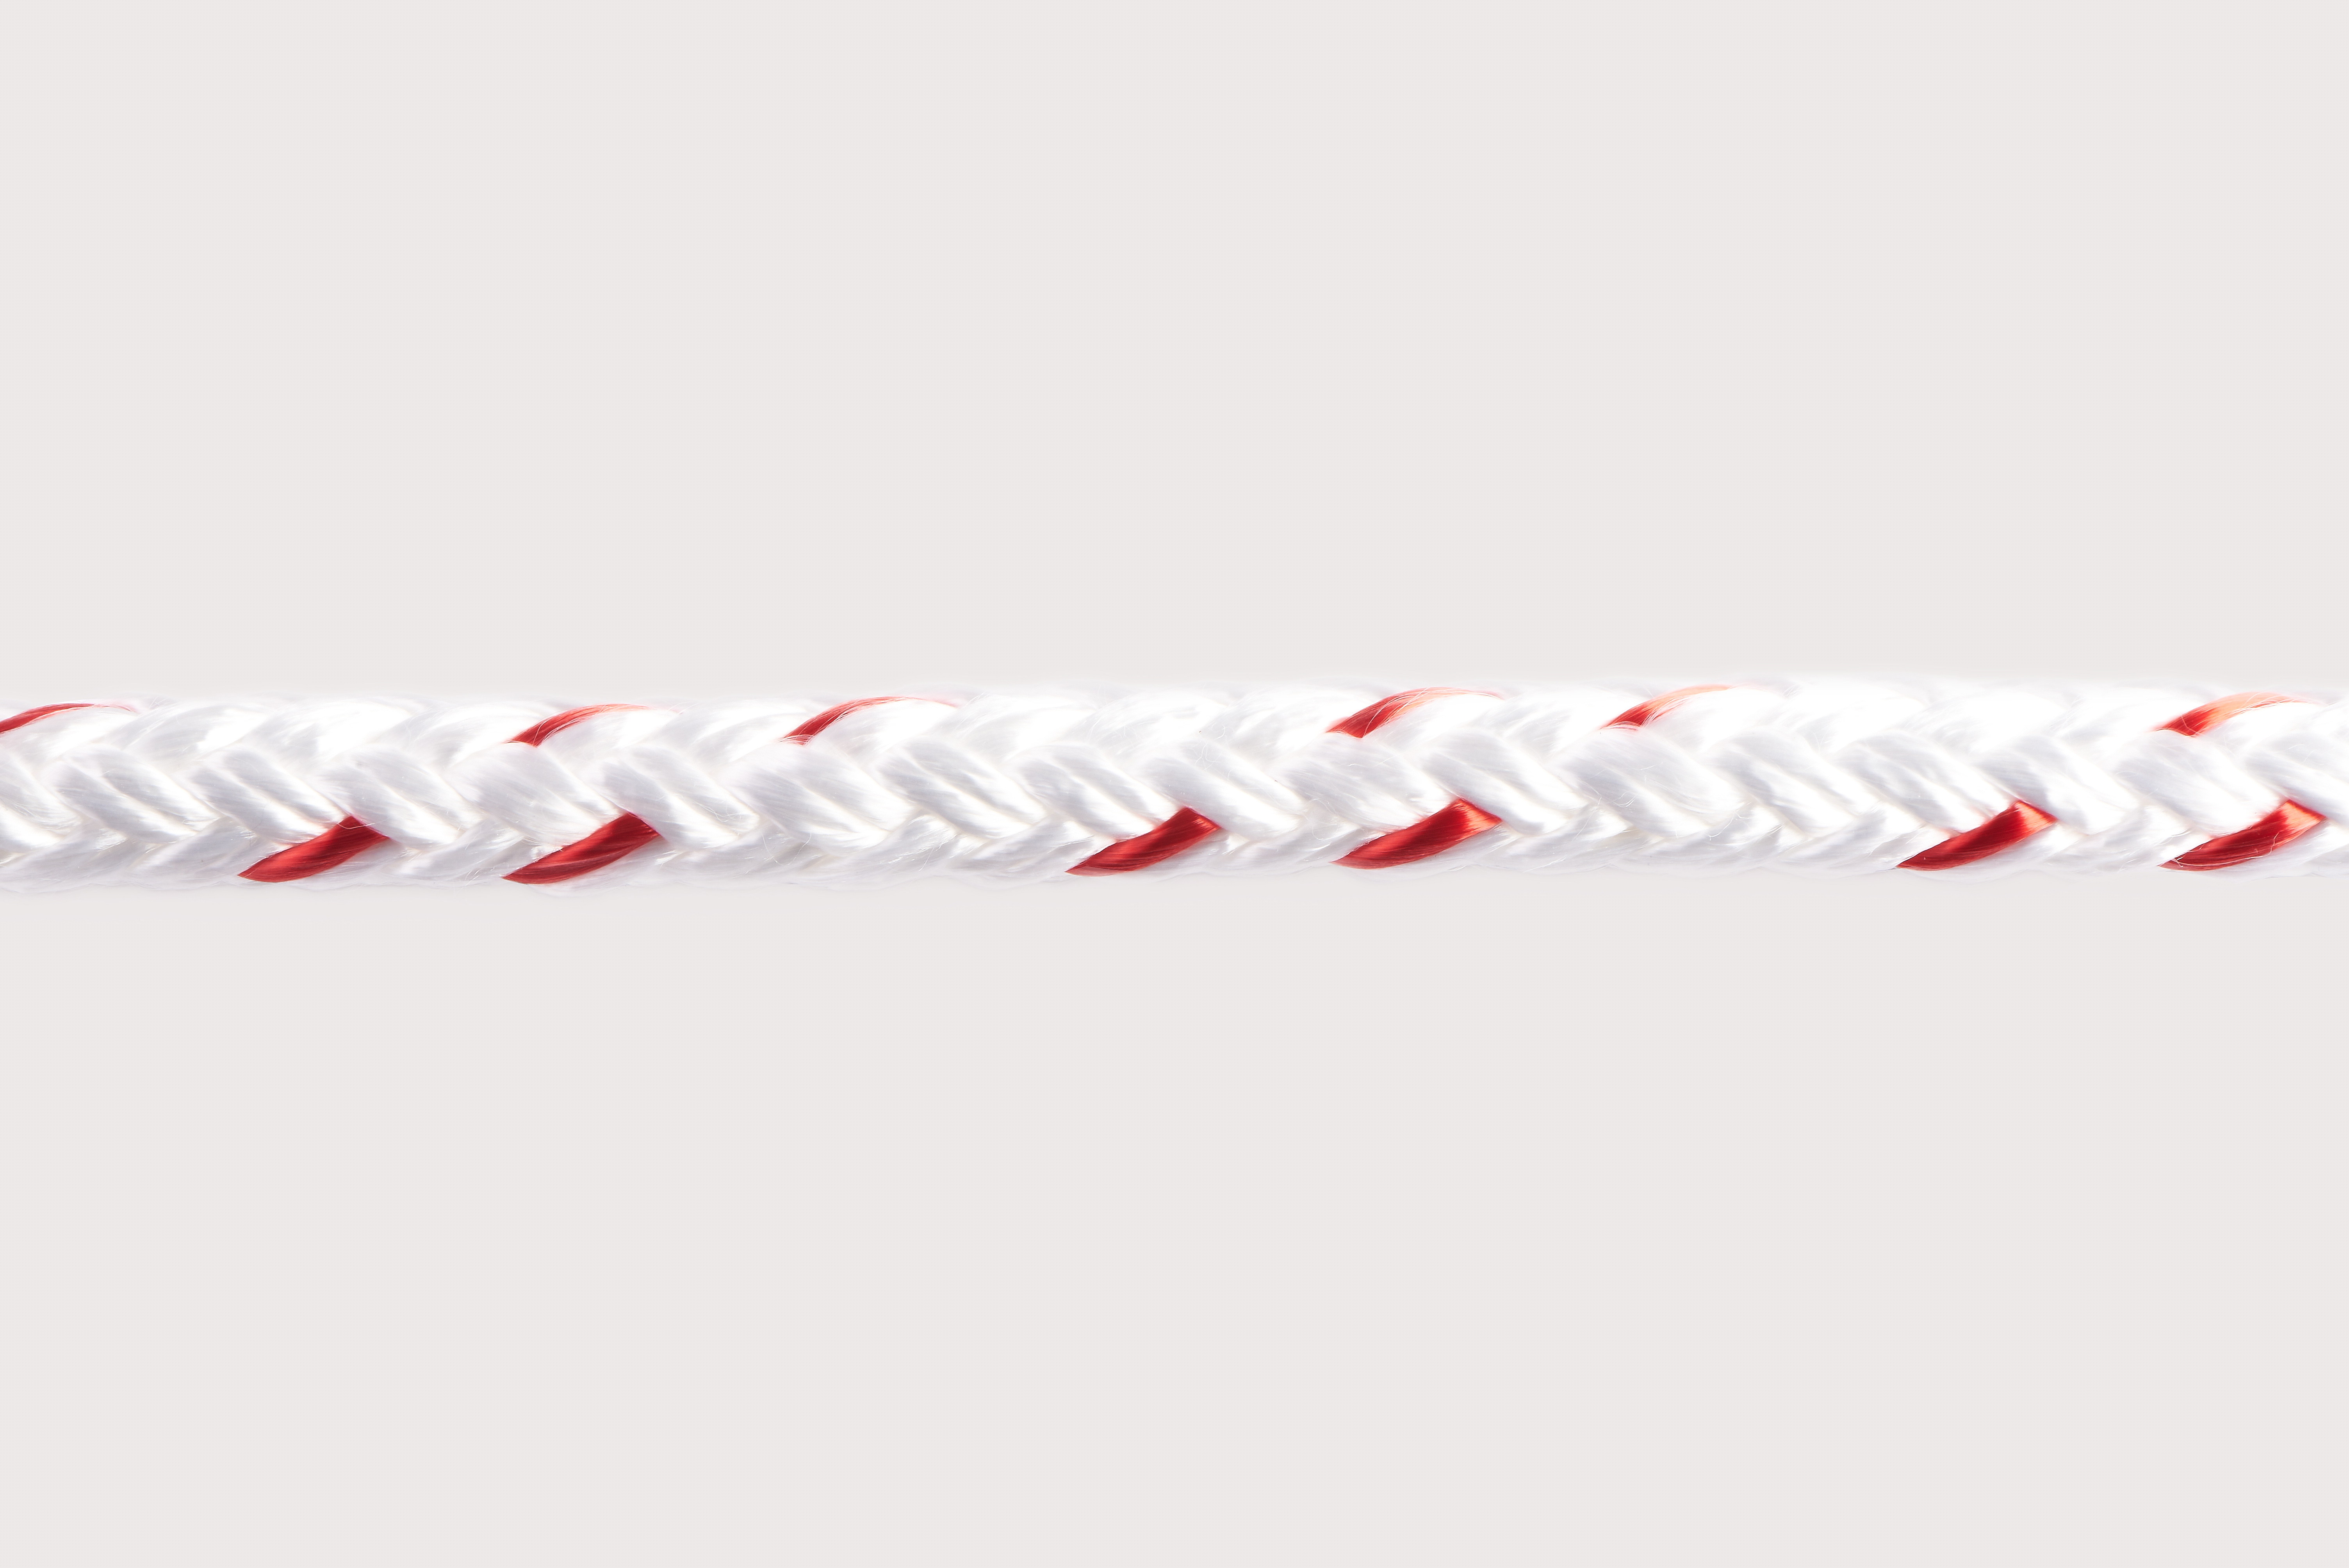 Orion-Cordage-Powerplex 12-Strand Polyester (One-In-Train)-White I Red-Horizontal50.jpg